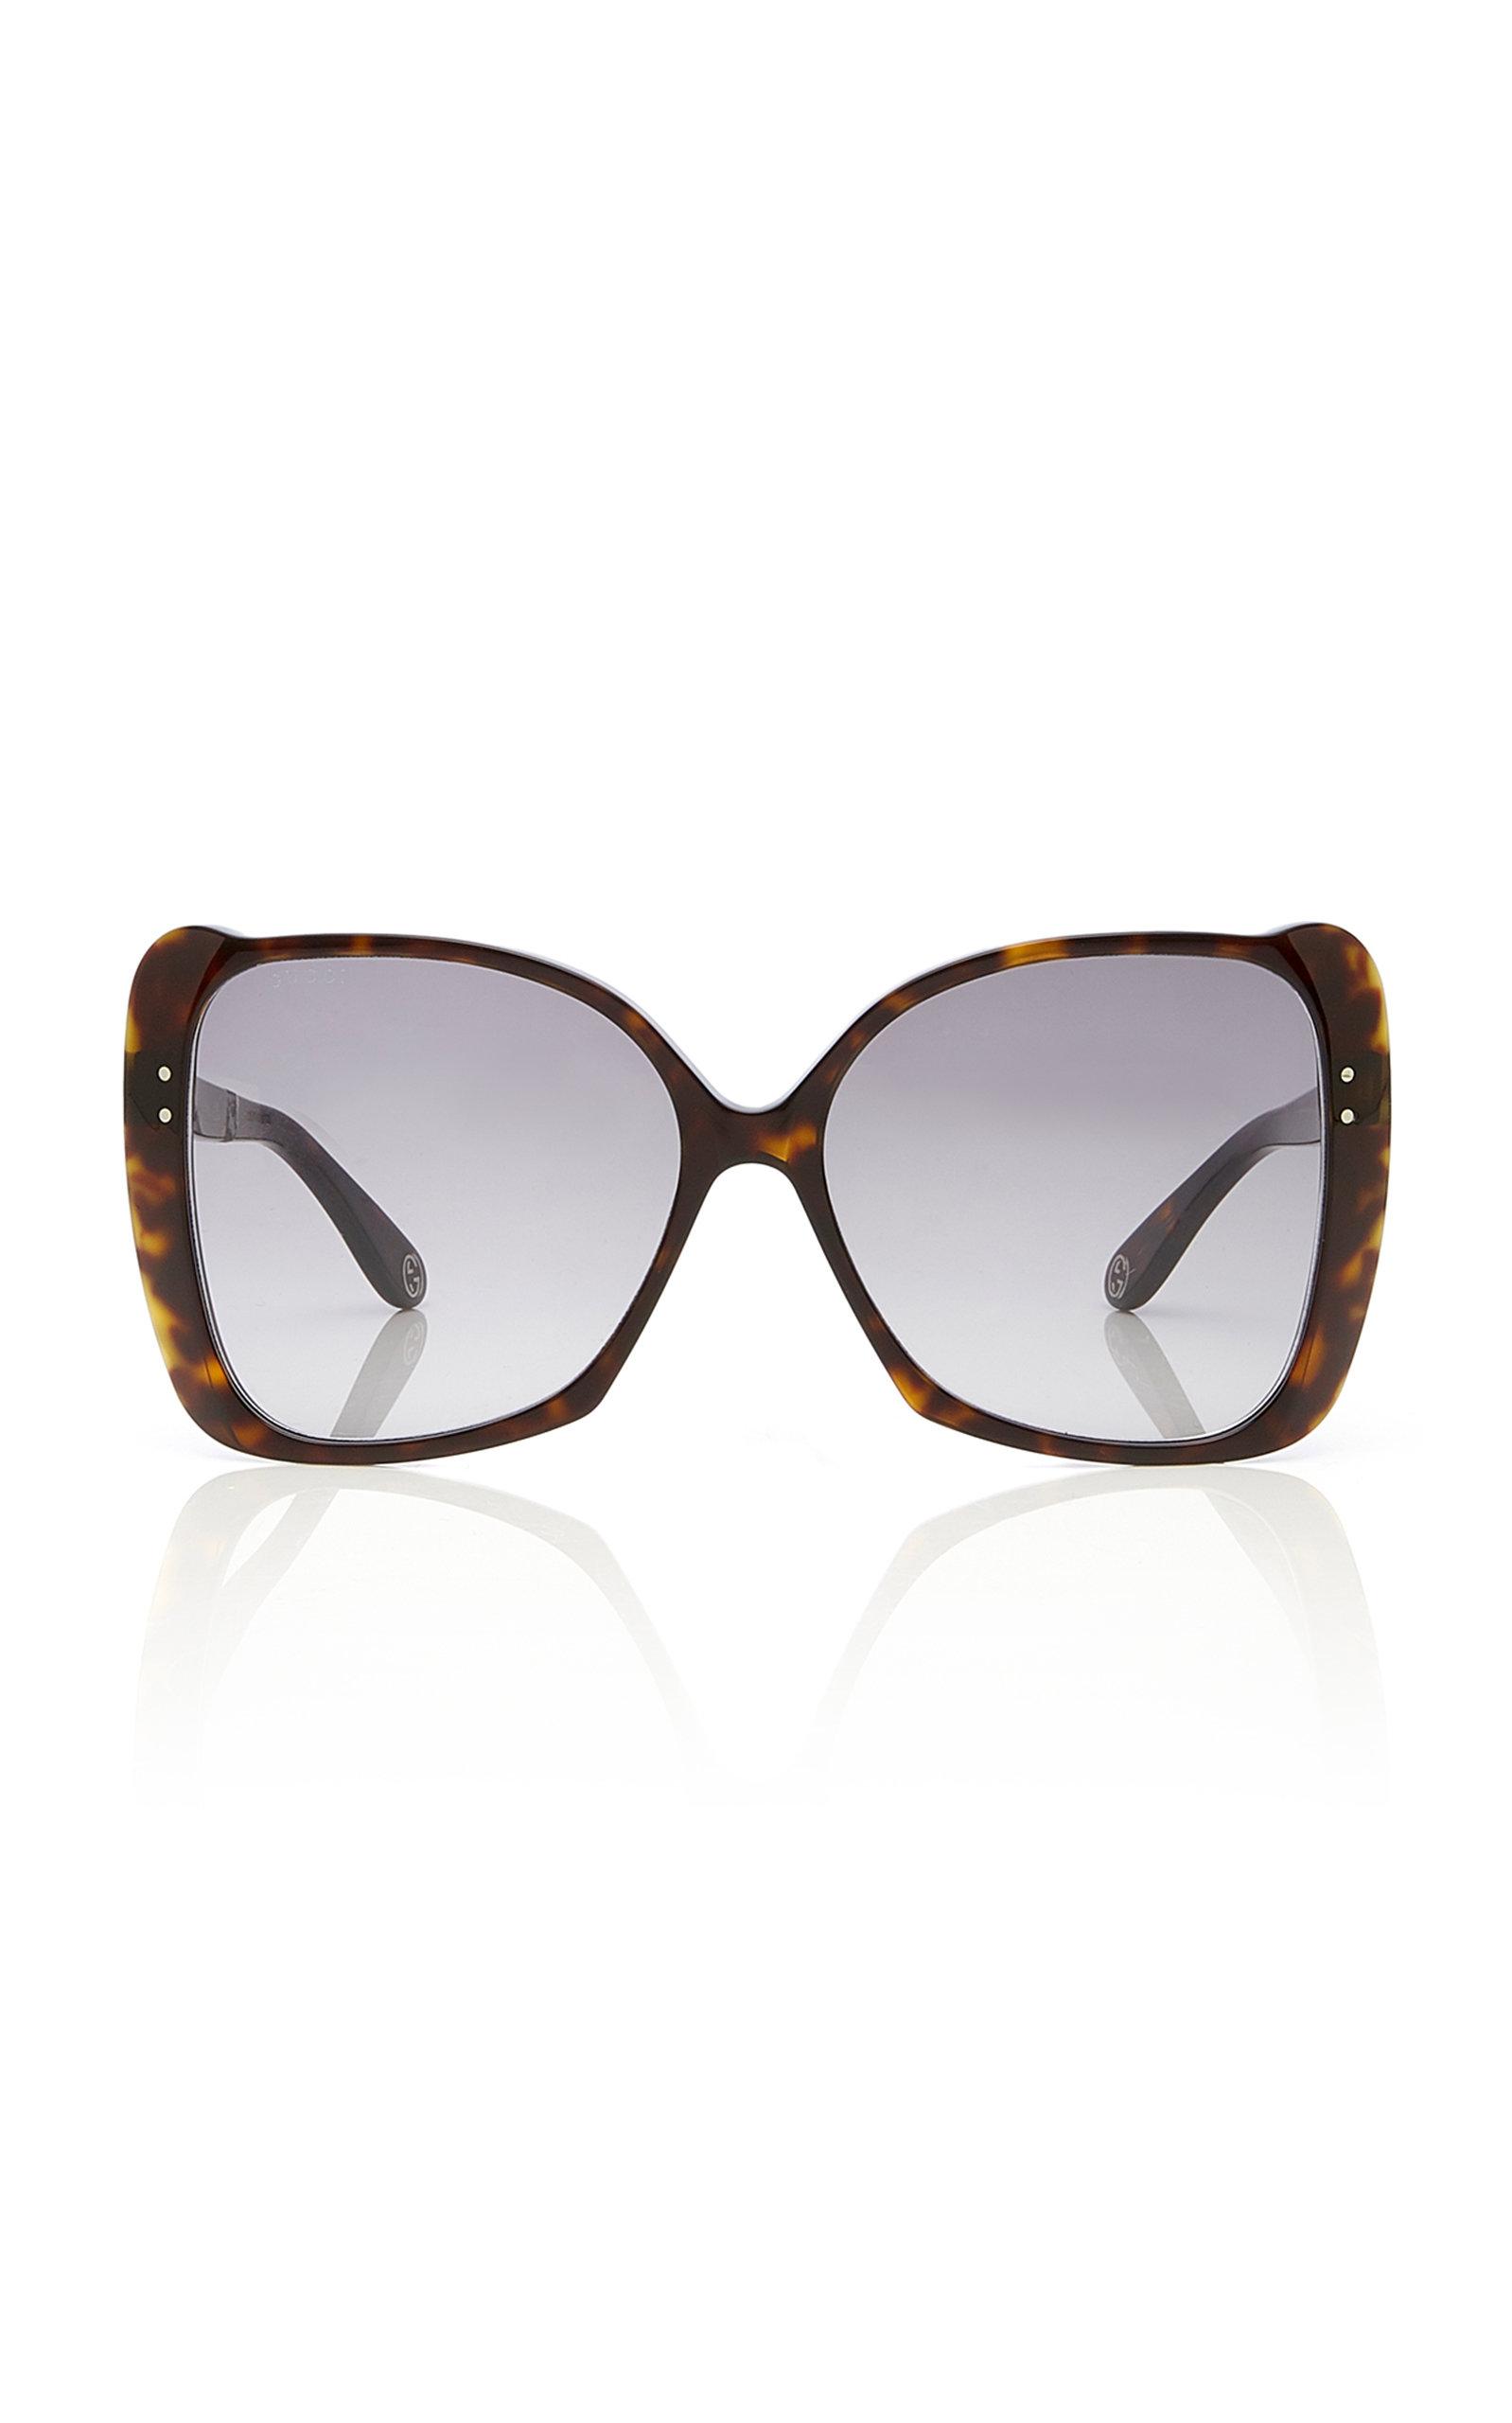 6e2a1091bb00 Gucci SunglassesButterfly-Frame Tortoiseshell Acetate Sunglasses. CLOSE.  Loading